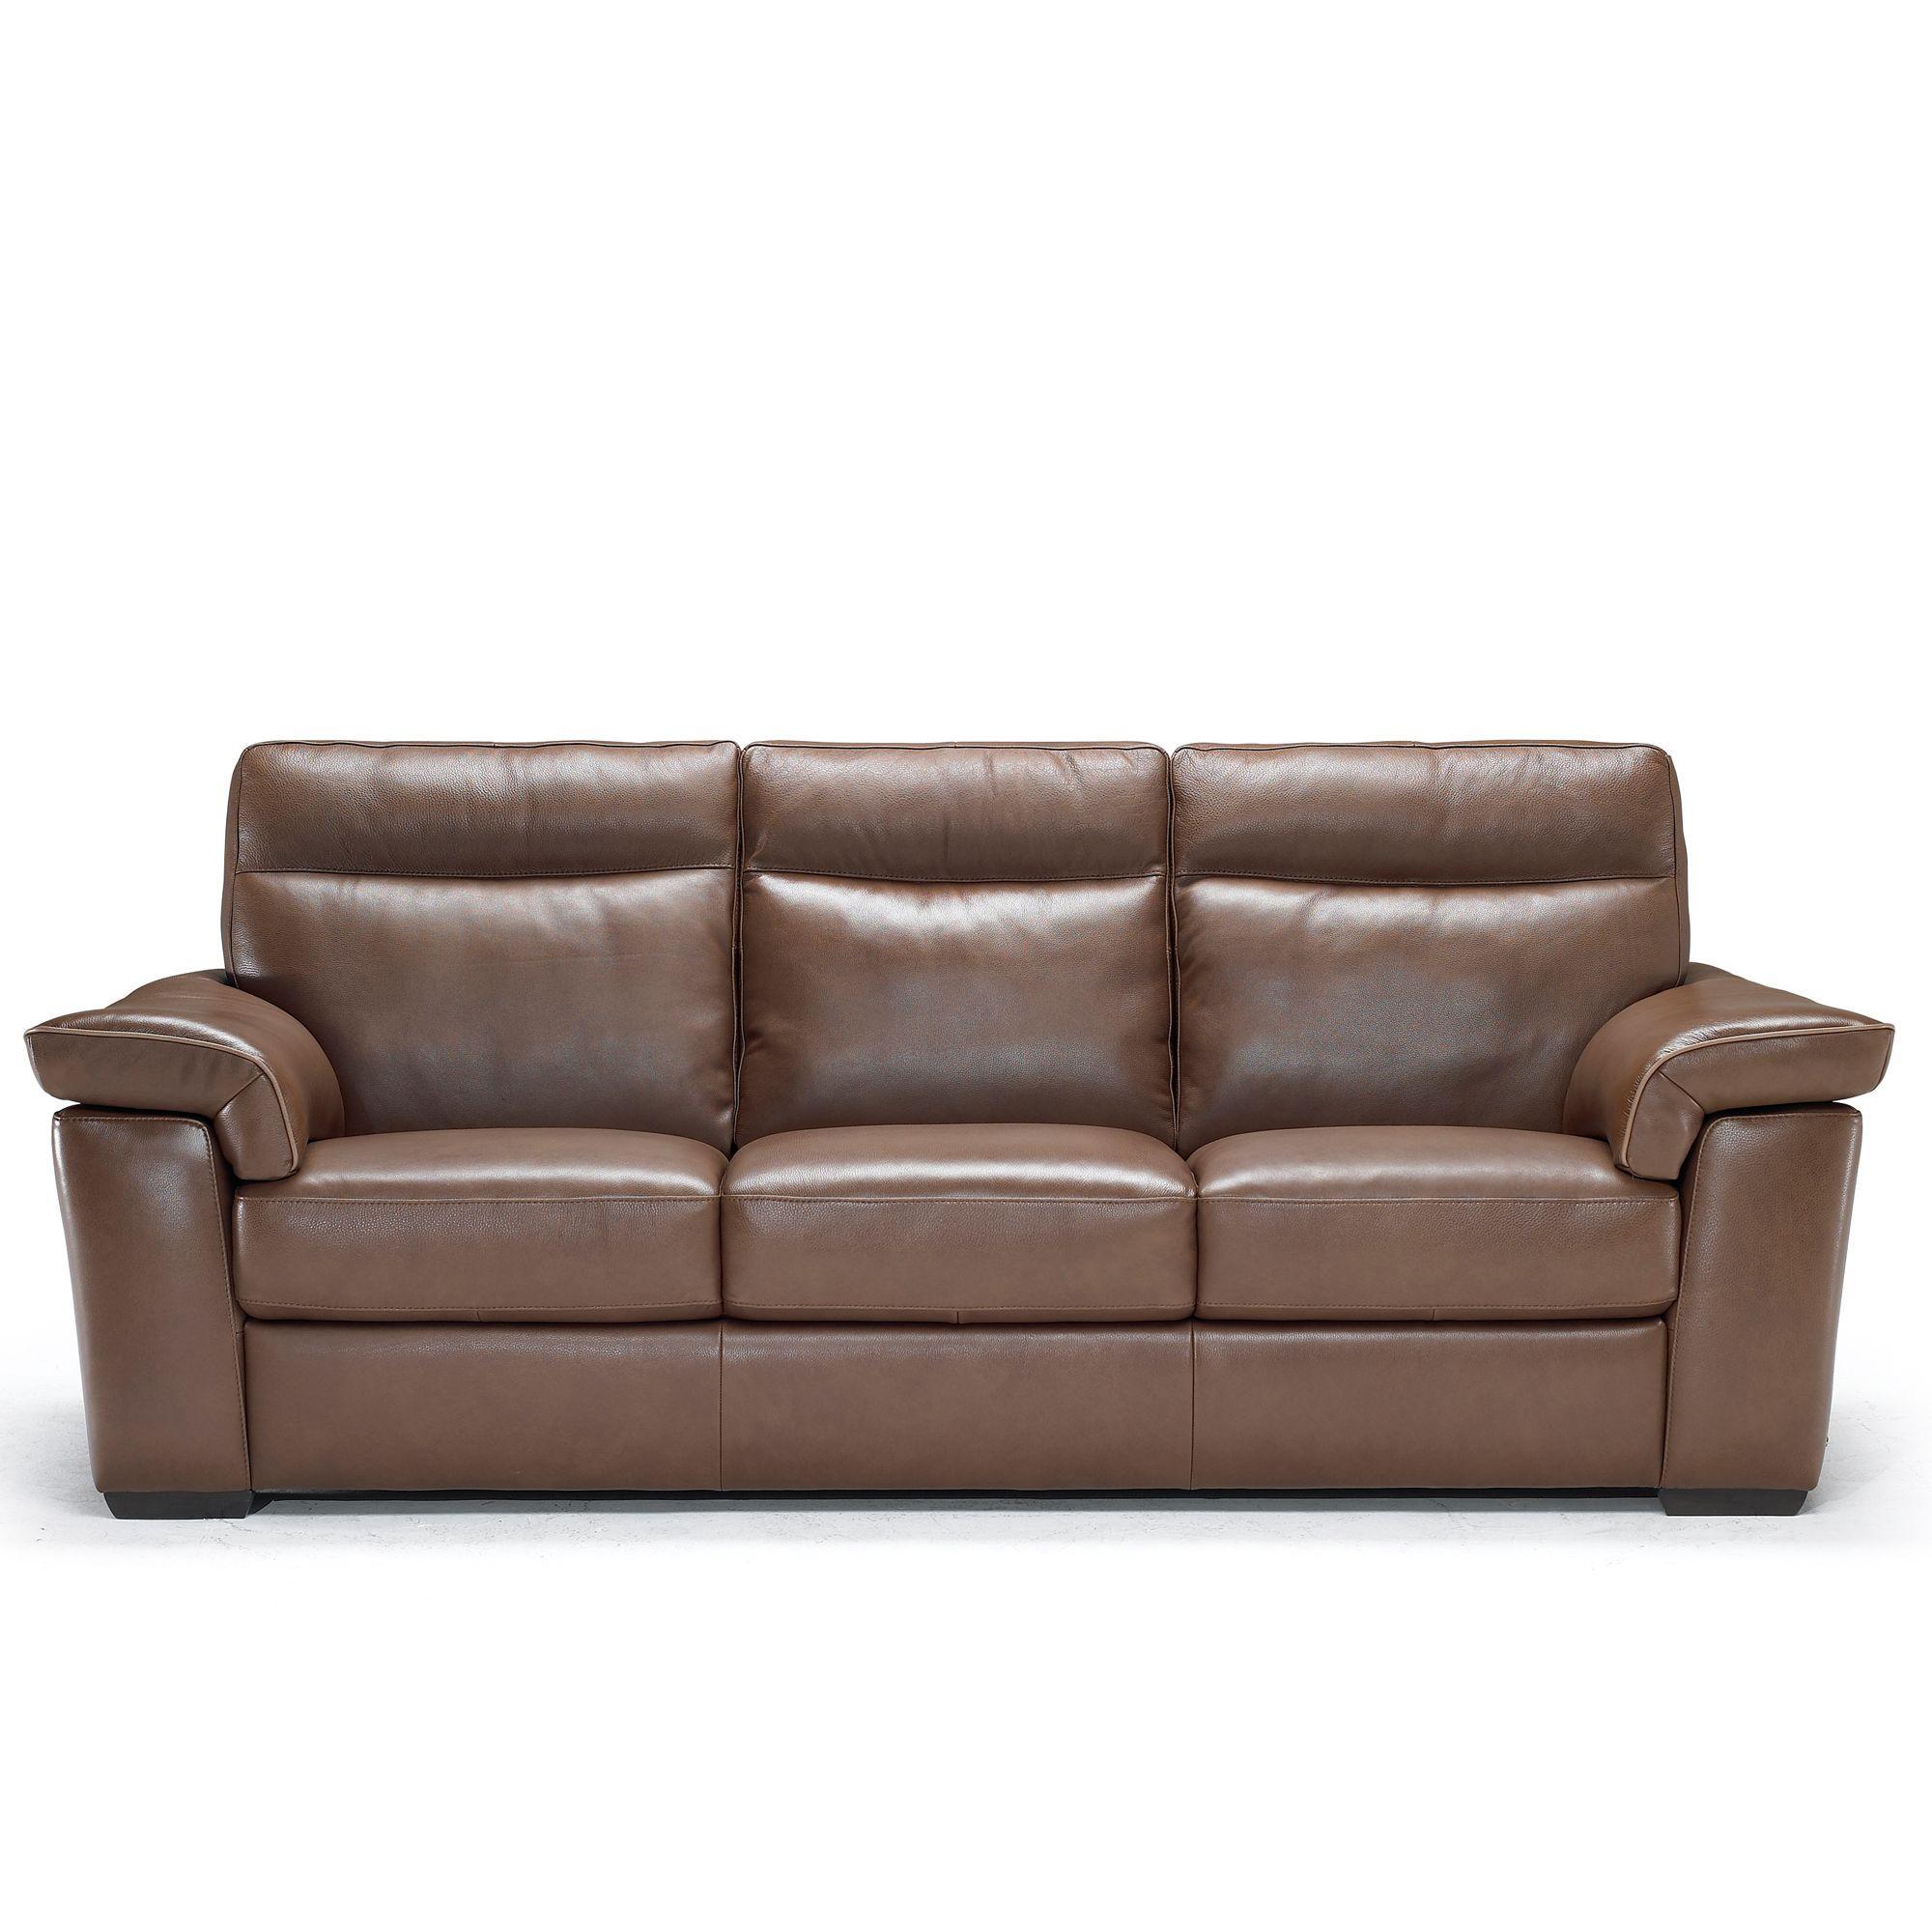 Natuzzi Corner Sofa Uk Natuzzi sofa clearance and leather sofas